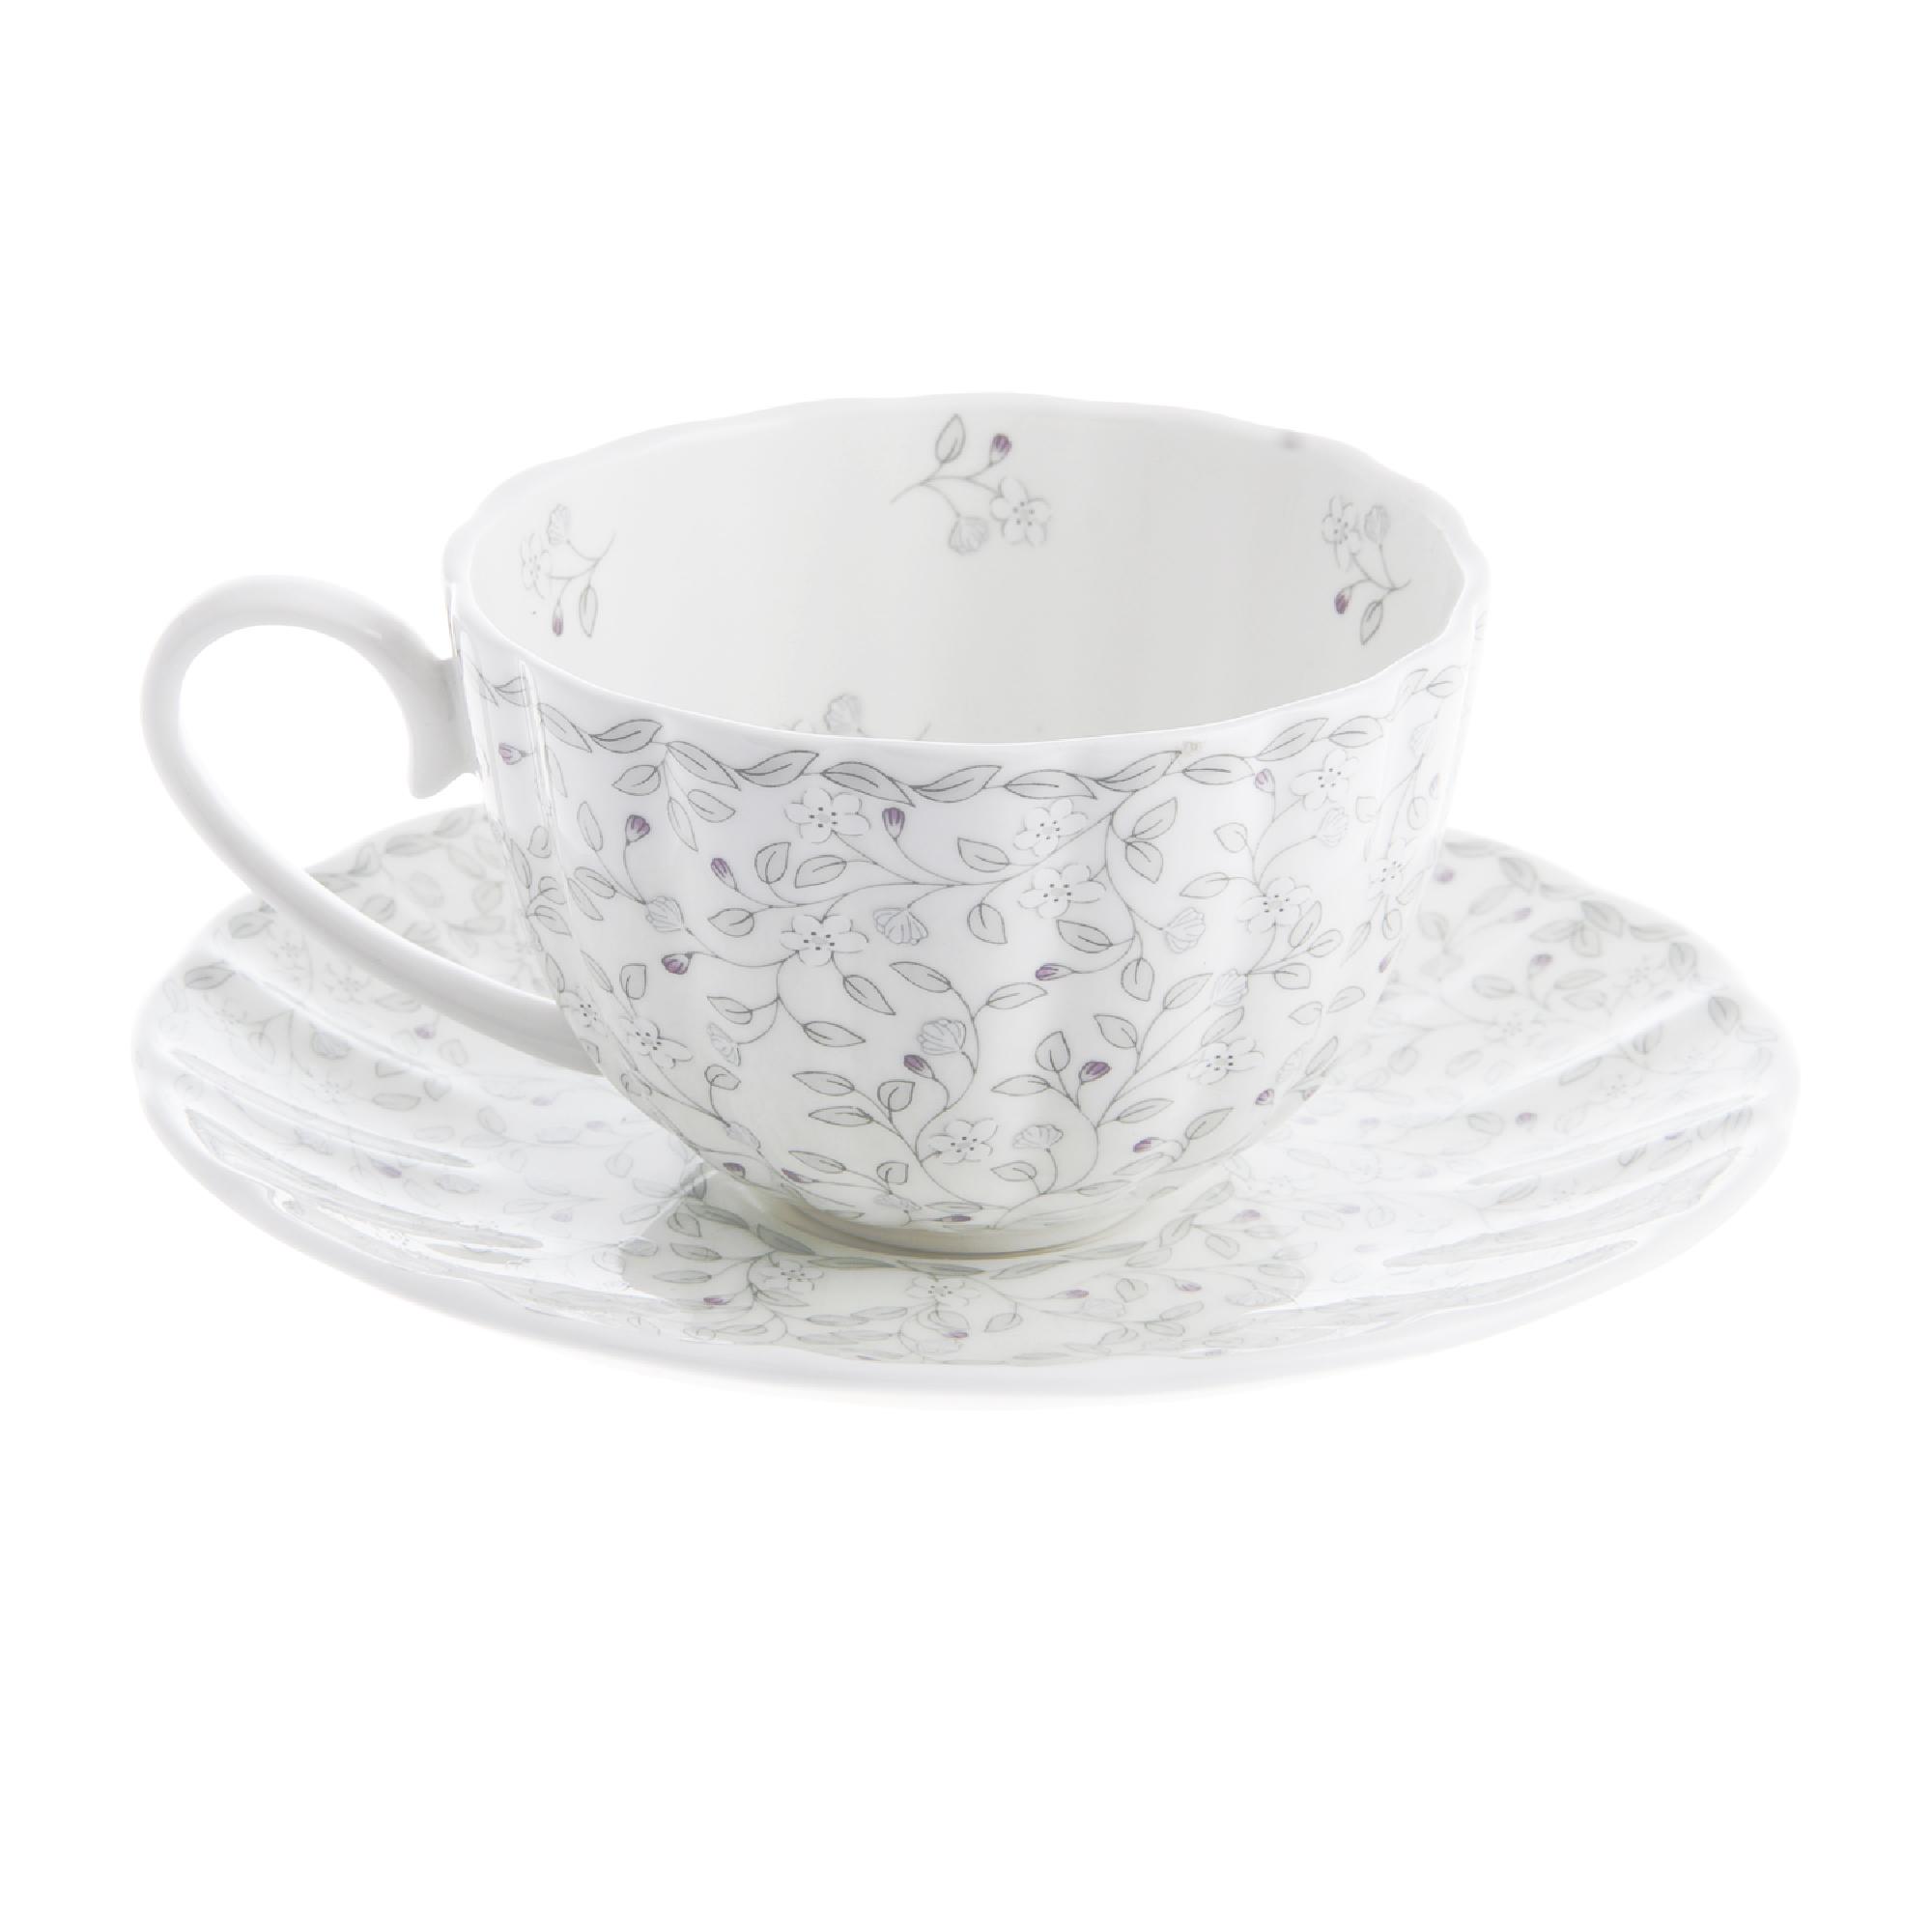 Чашка чайная 300 мл 1/2 джулия грэй Hatori